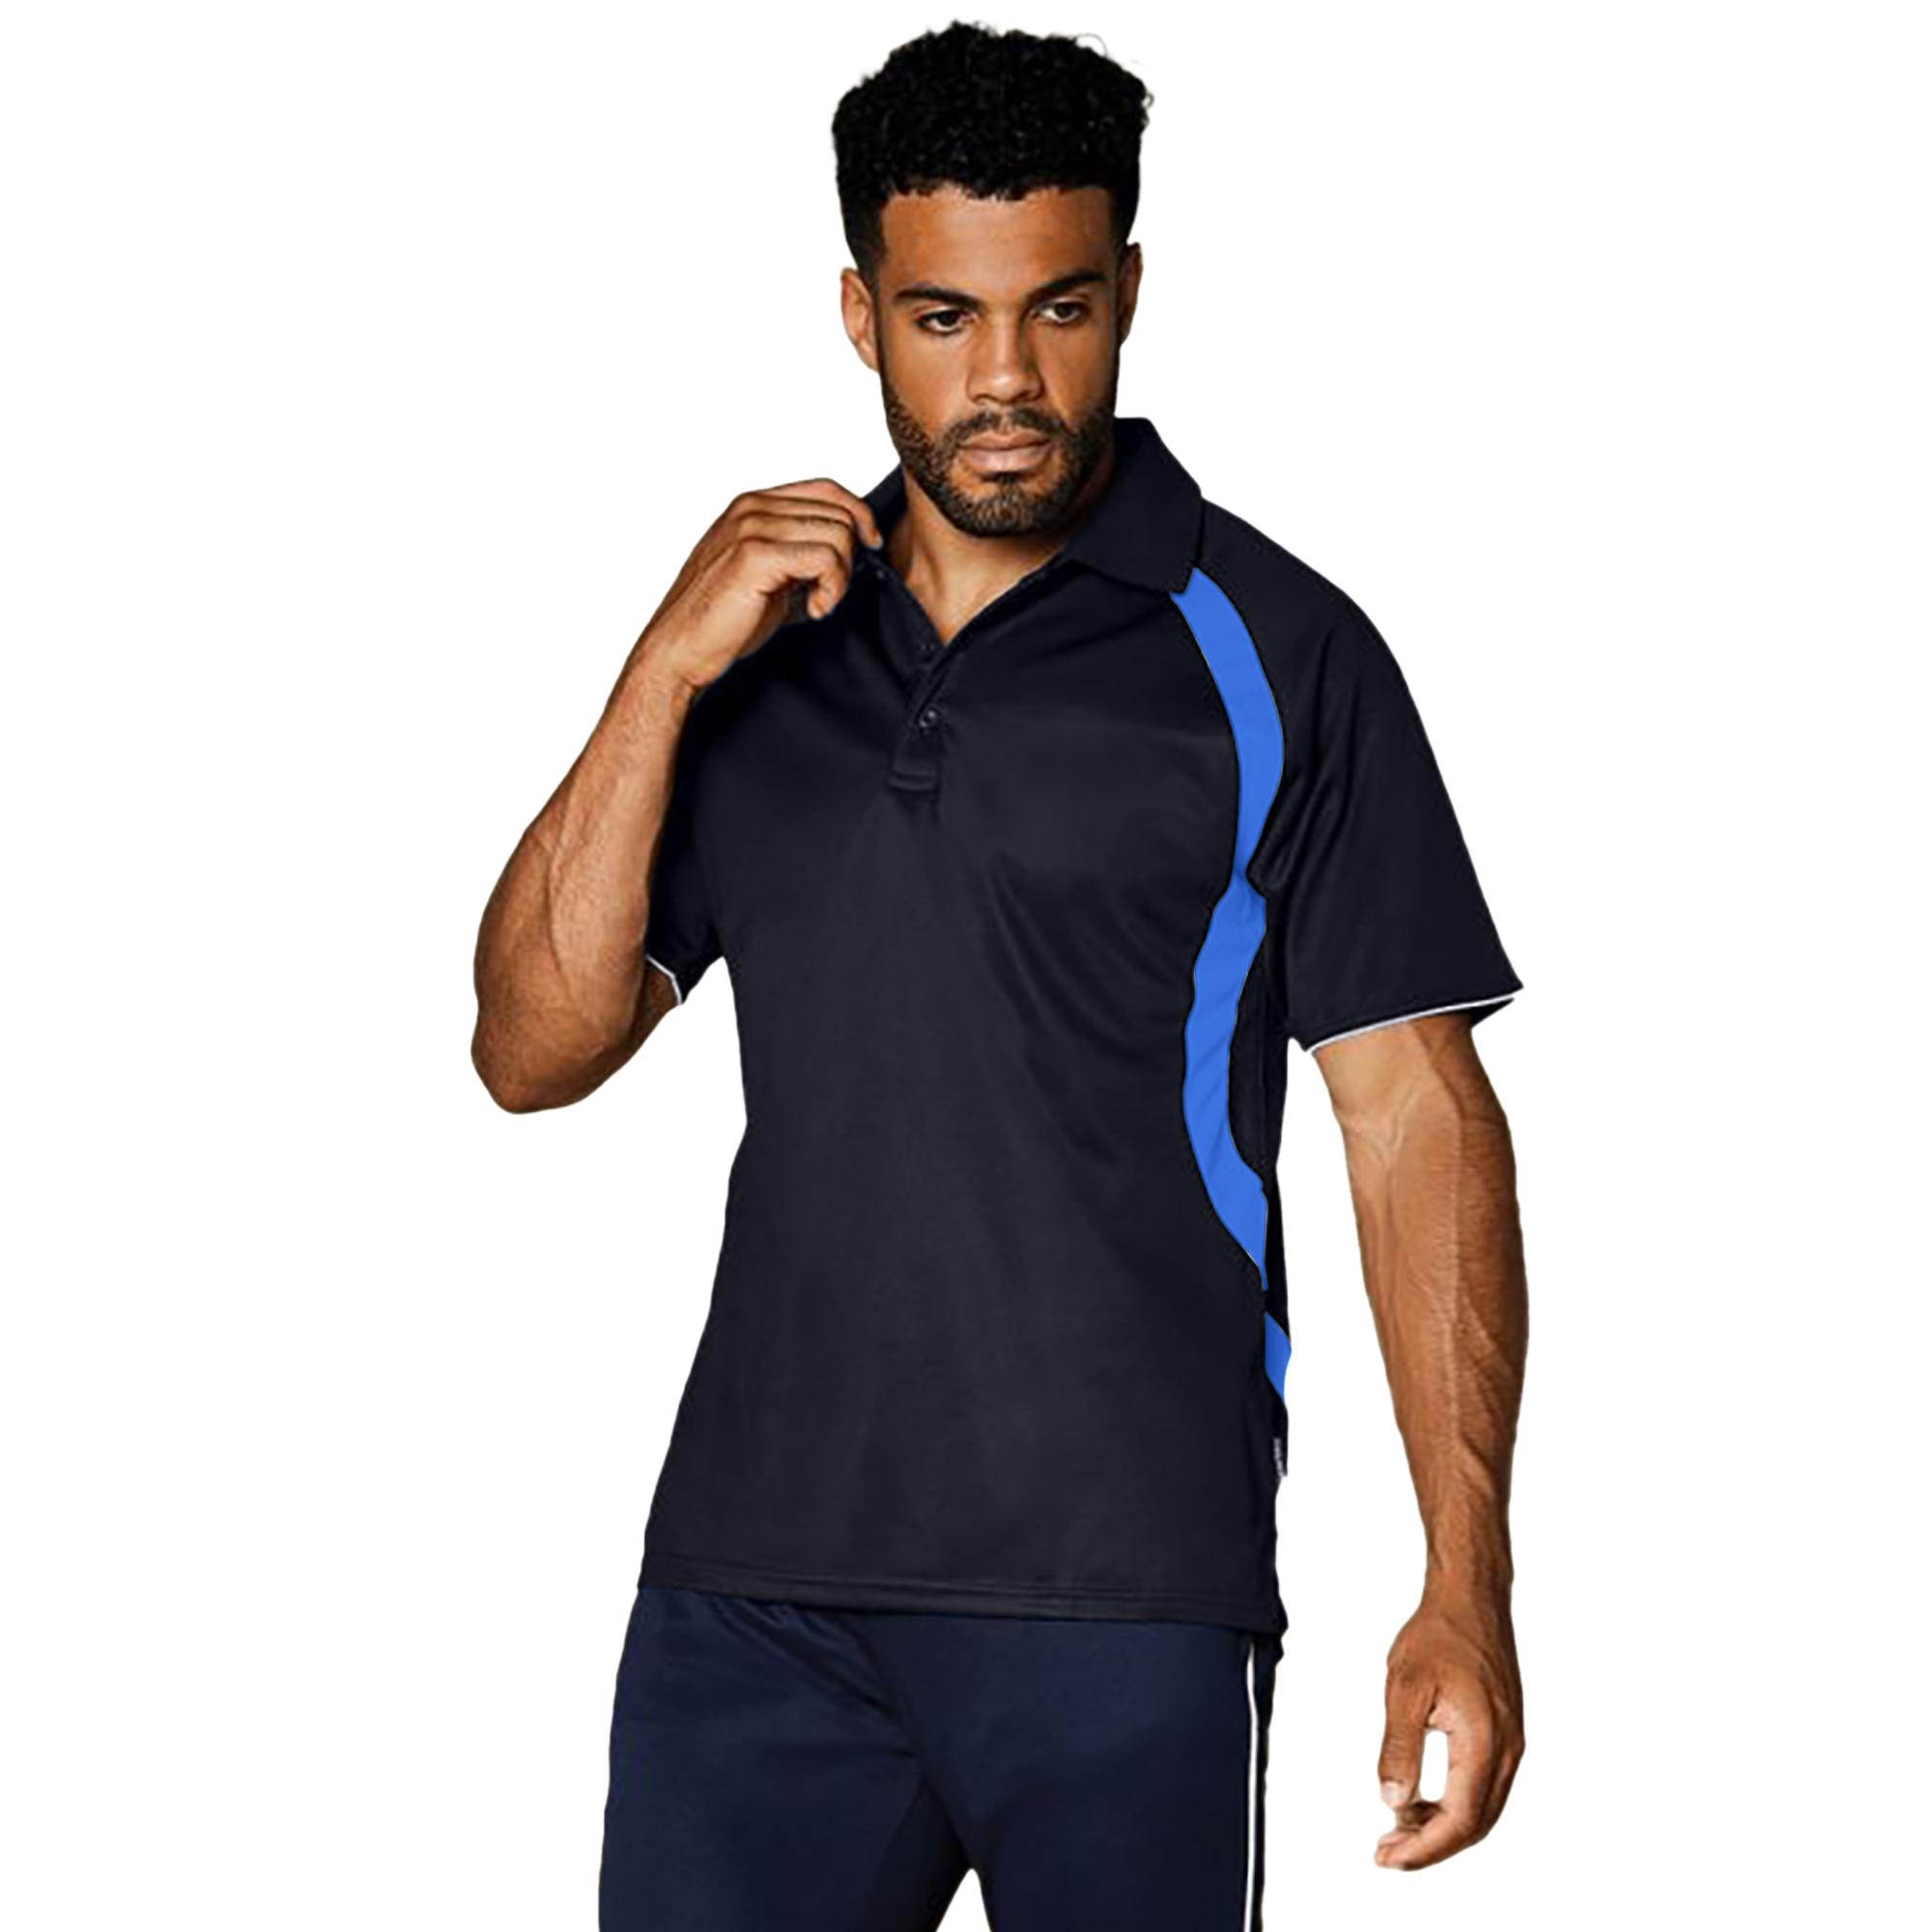 Gamegear-Mens-Cooltex-Riviera-Polo-Shirt-Mens-Sportswear-BC434